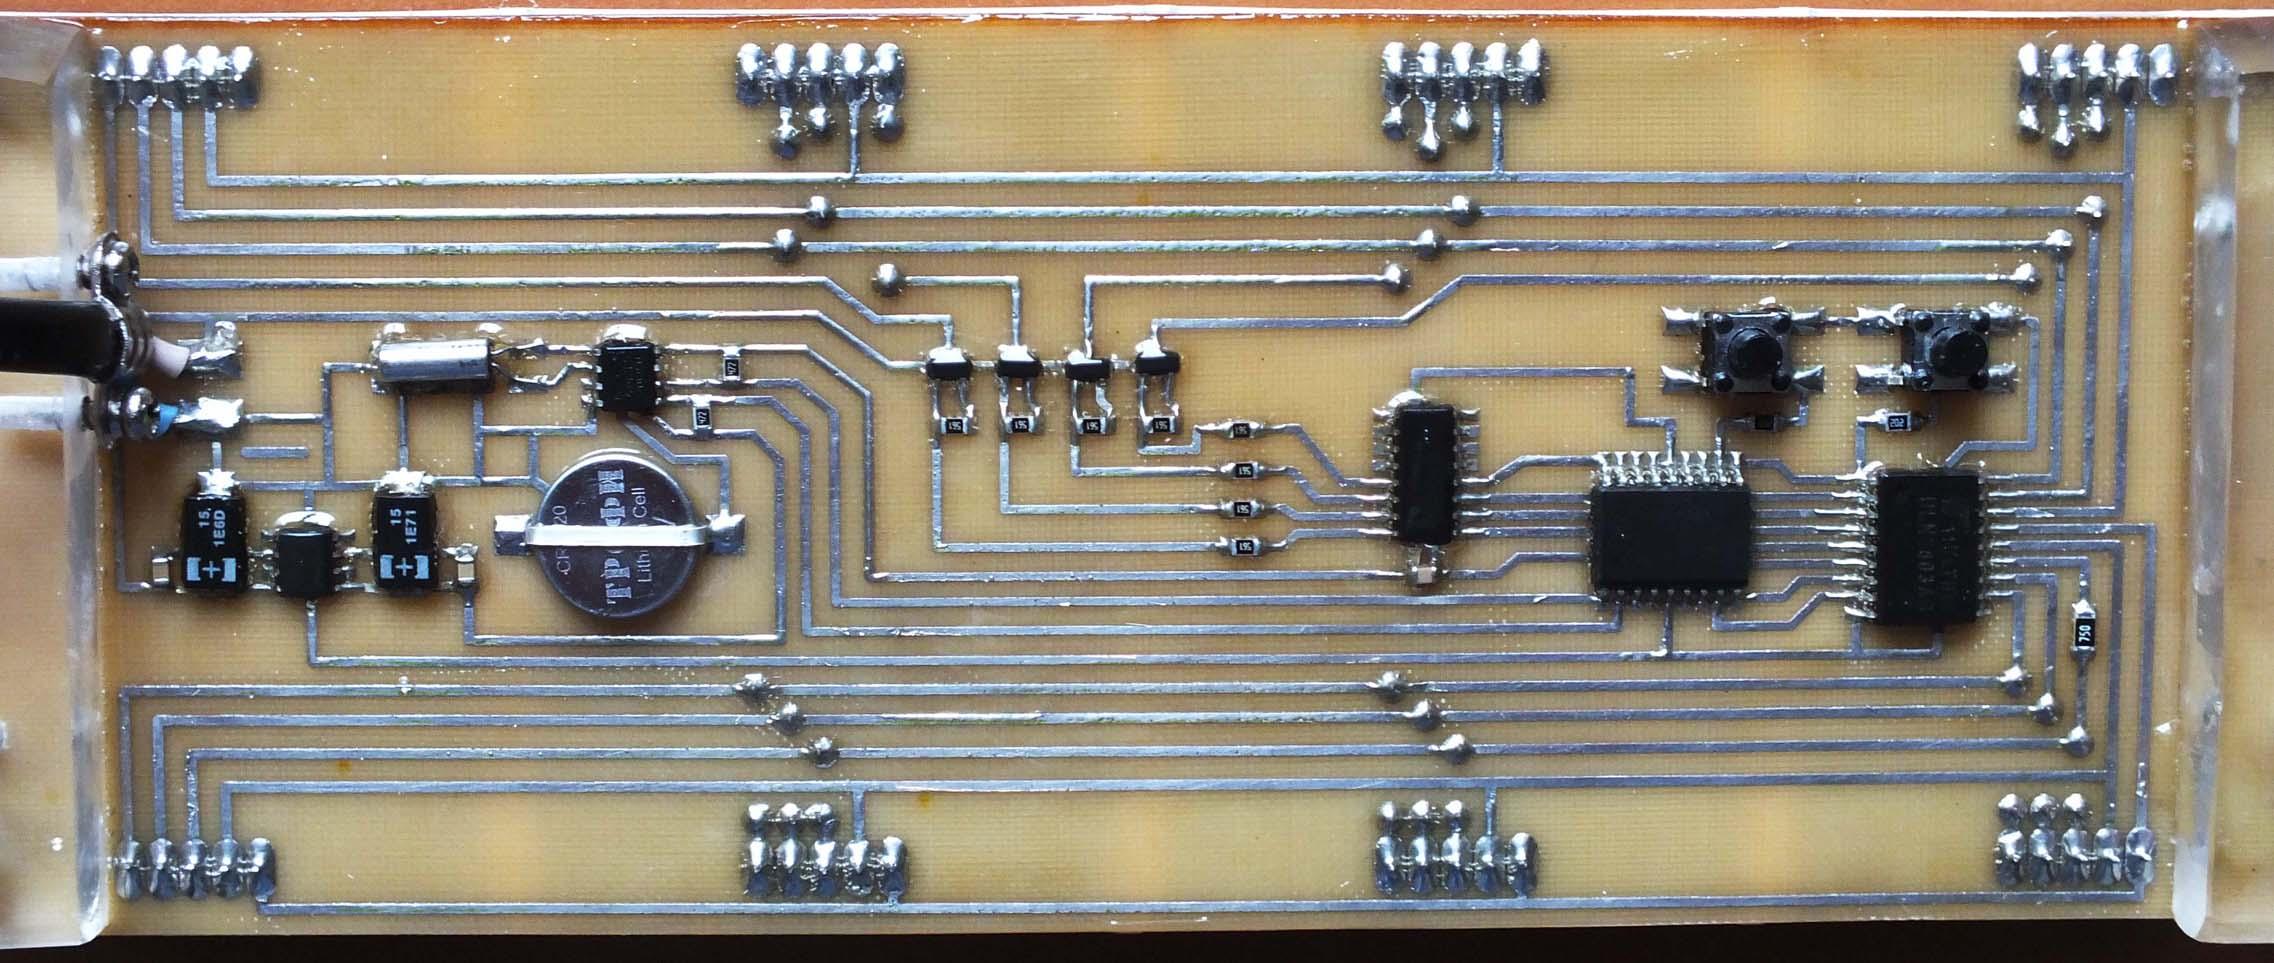 семисегментный электронный термометр схема